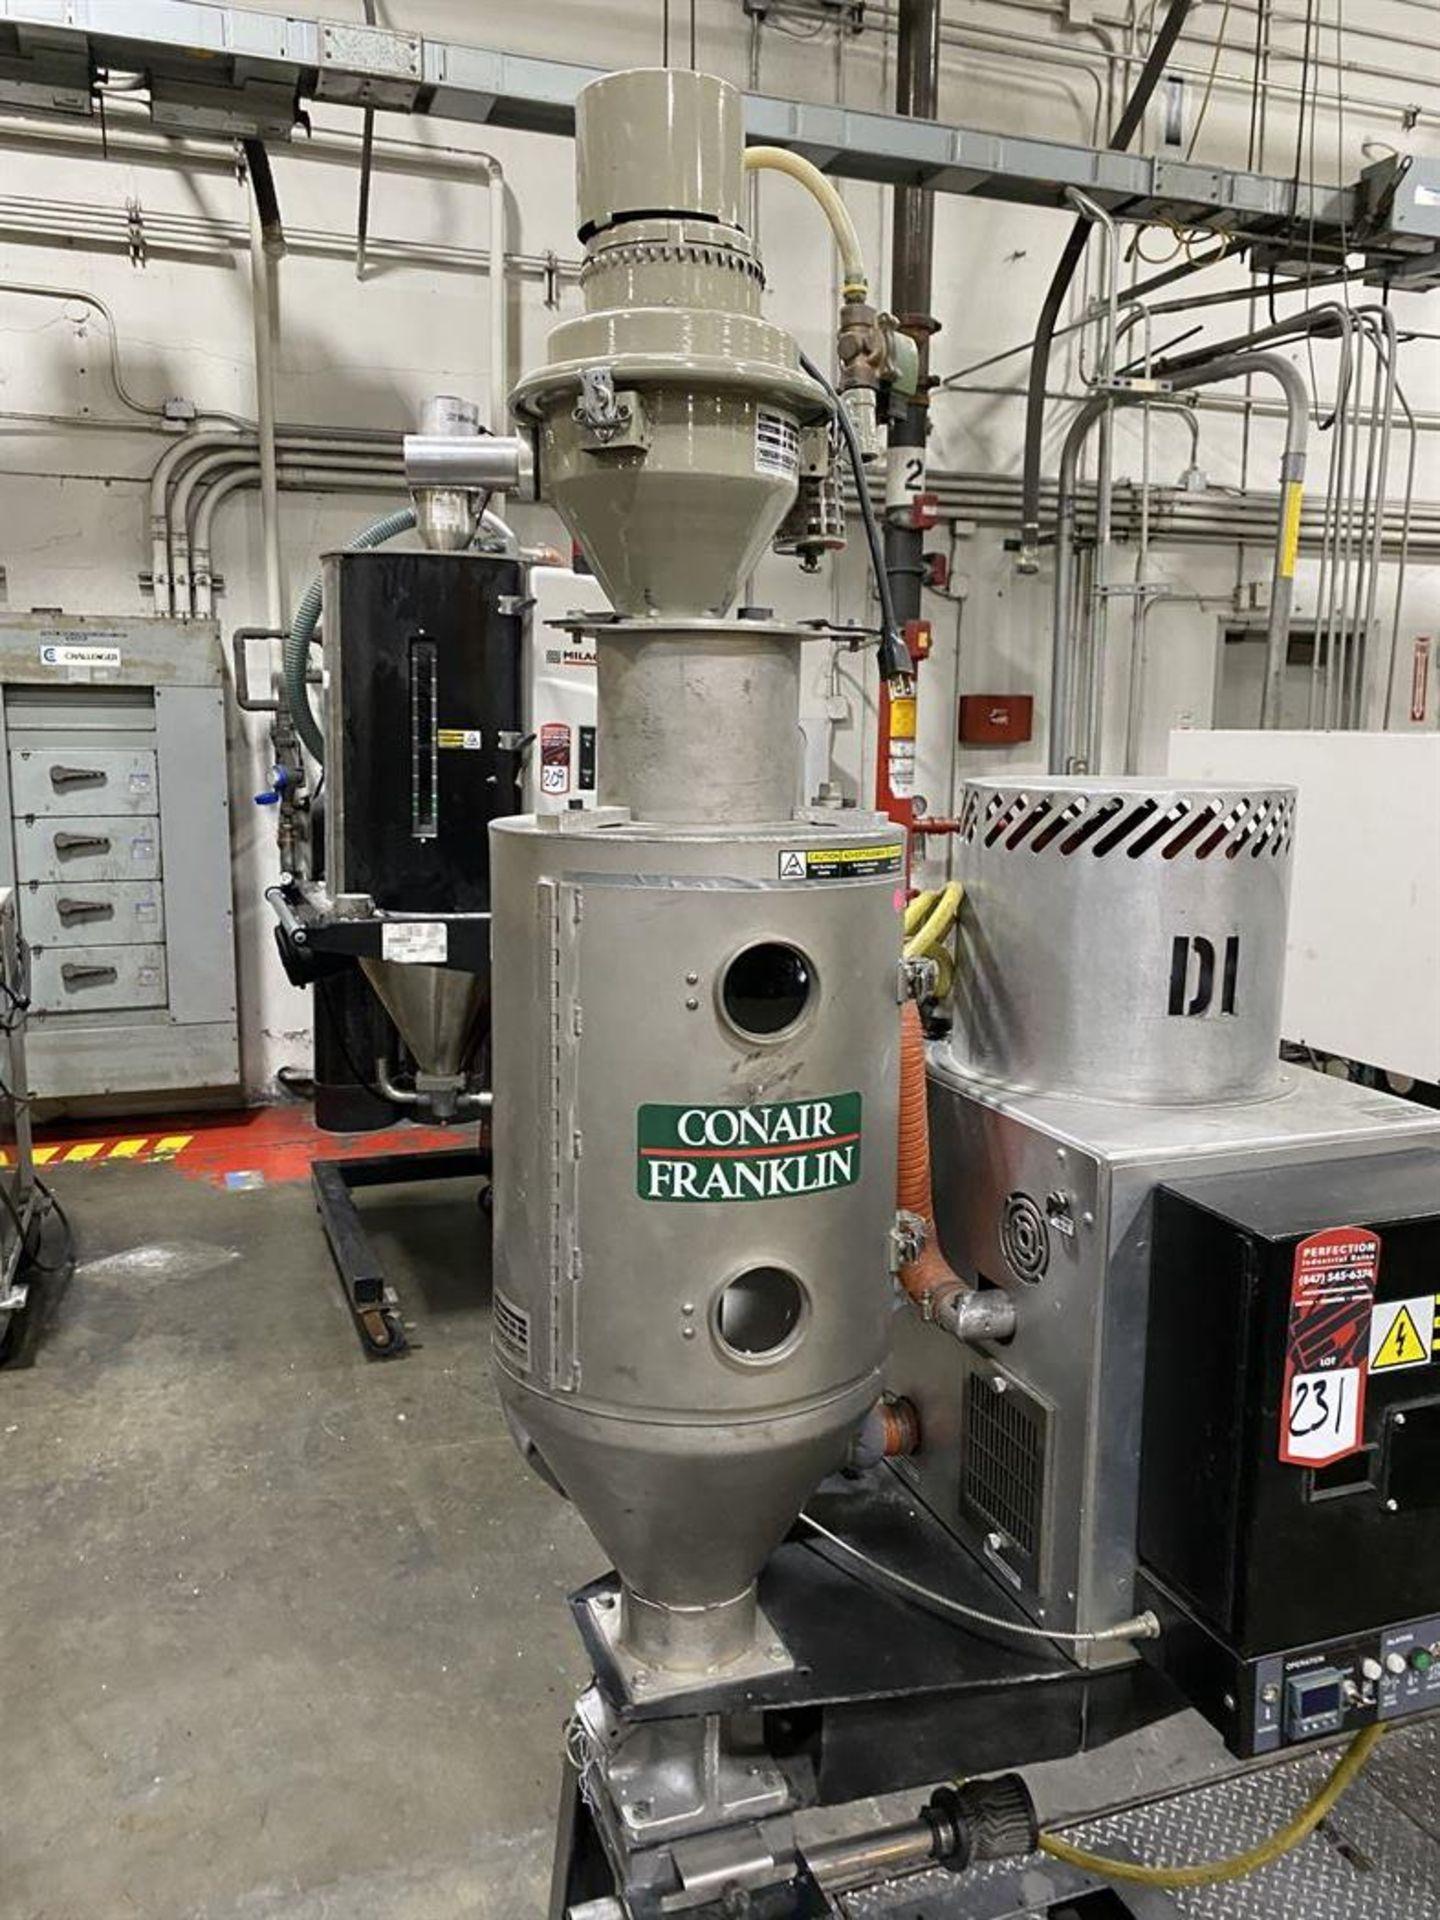 Lot 231 - Conair Franklin Hopper Dryer System Comprising SC-15 Dryer, s/n 8743, CH14U-2 Hopper, and ML8 Vacuum